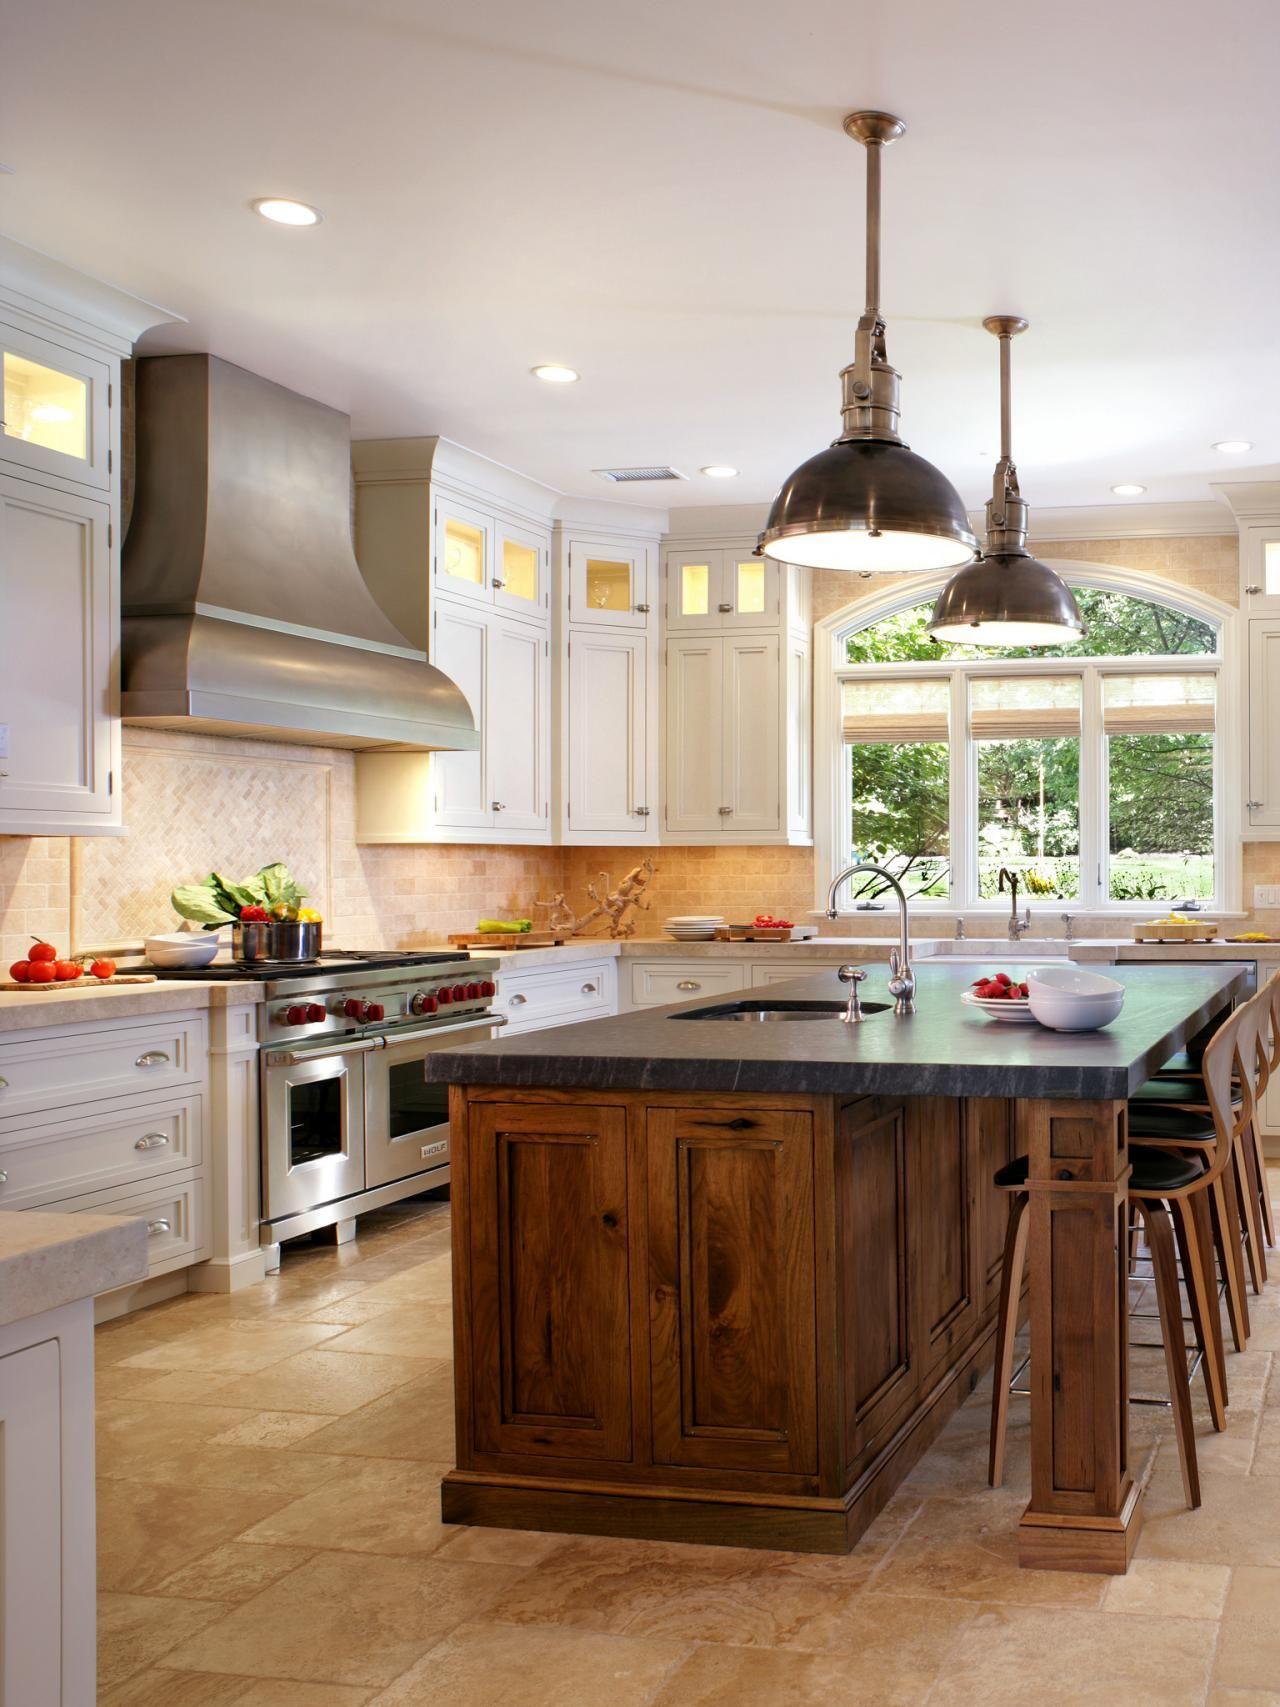 Walnut Kitchen Floor Walnut Island With Soapstone White Perimeter Cabinets Photos